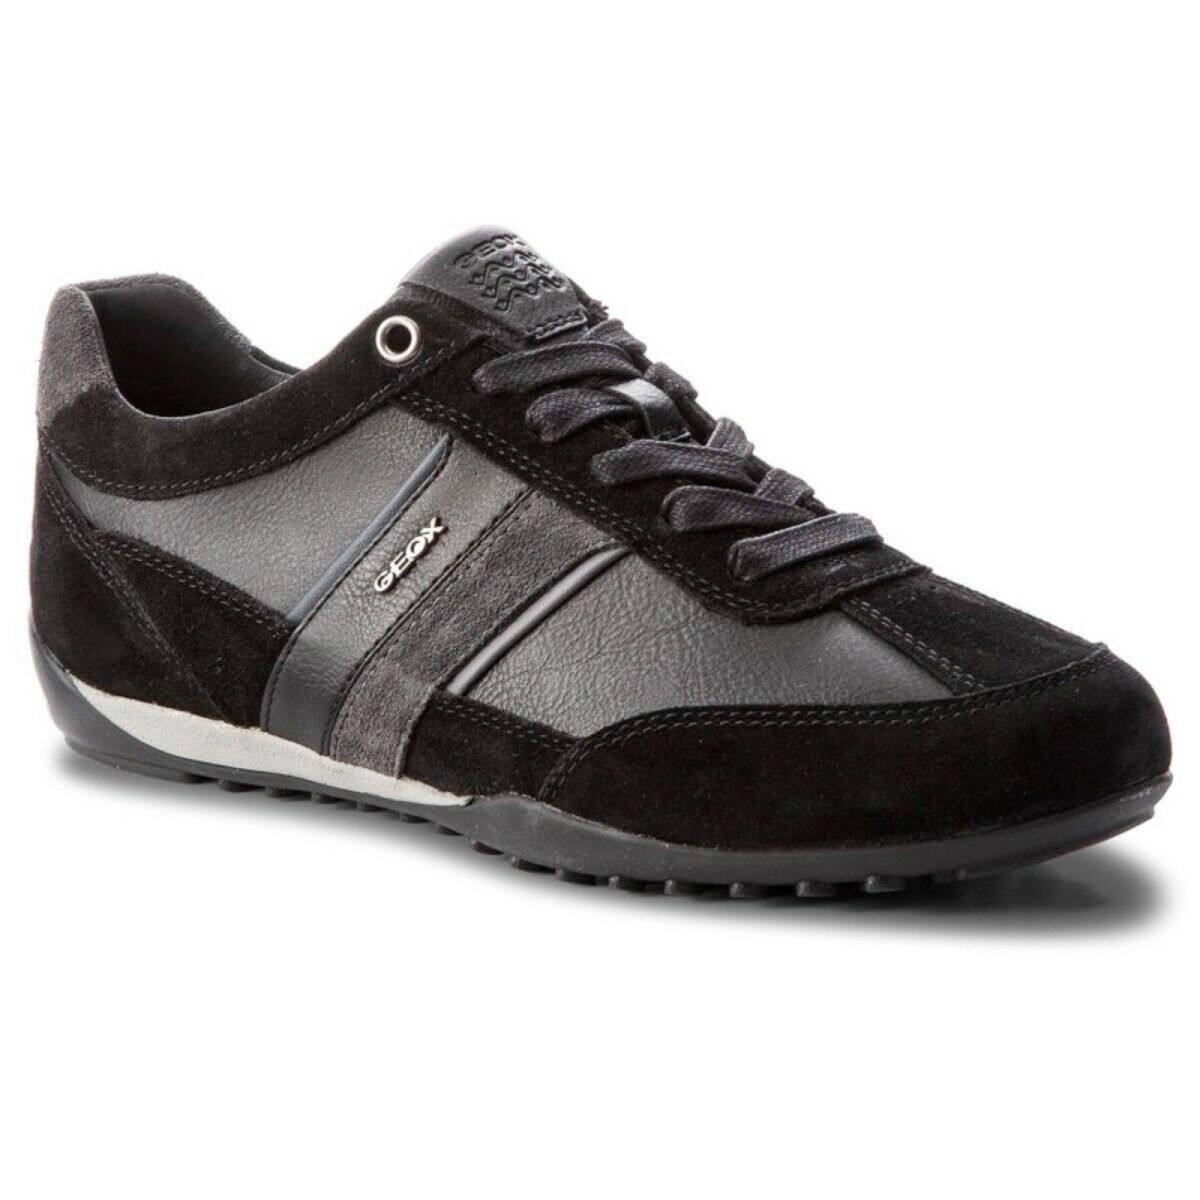 Geox Respira Men's u Wells C Low Top Trainers Lace up Shoes U52T5C Black